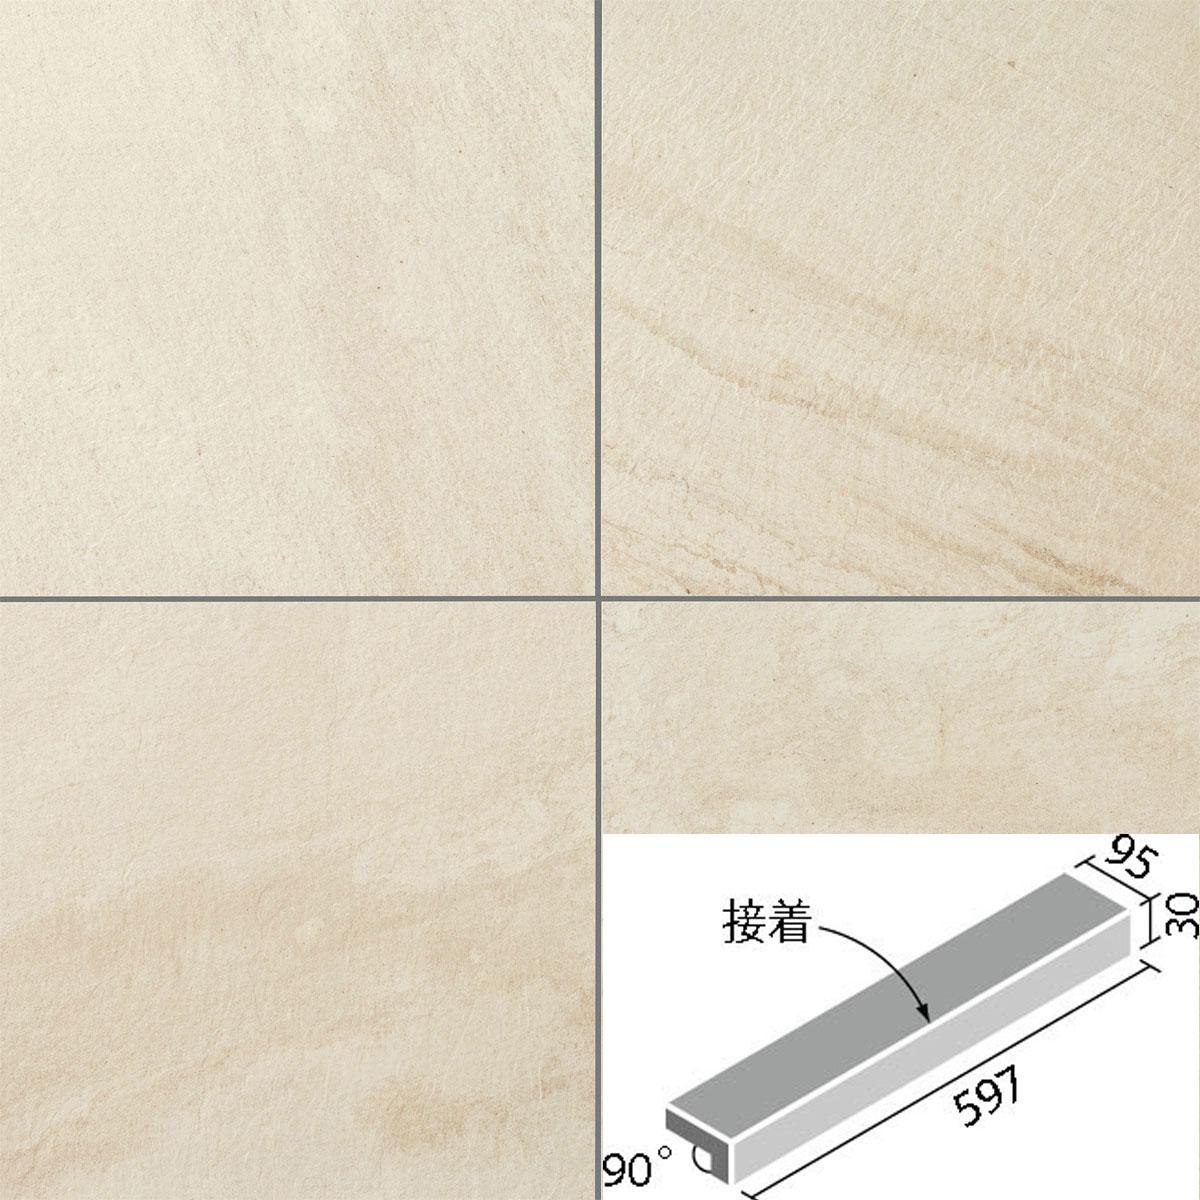 LIXIL(INAX) バレッジ 外床タイプ 600x100角垂れ付き段鼻(接着) IPF-601/VLD-12